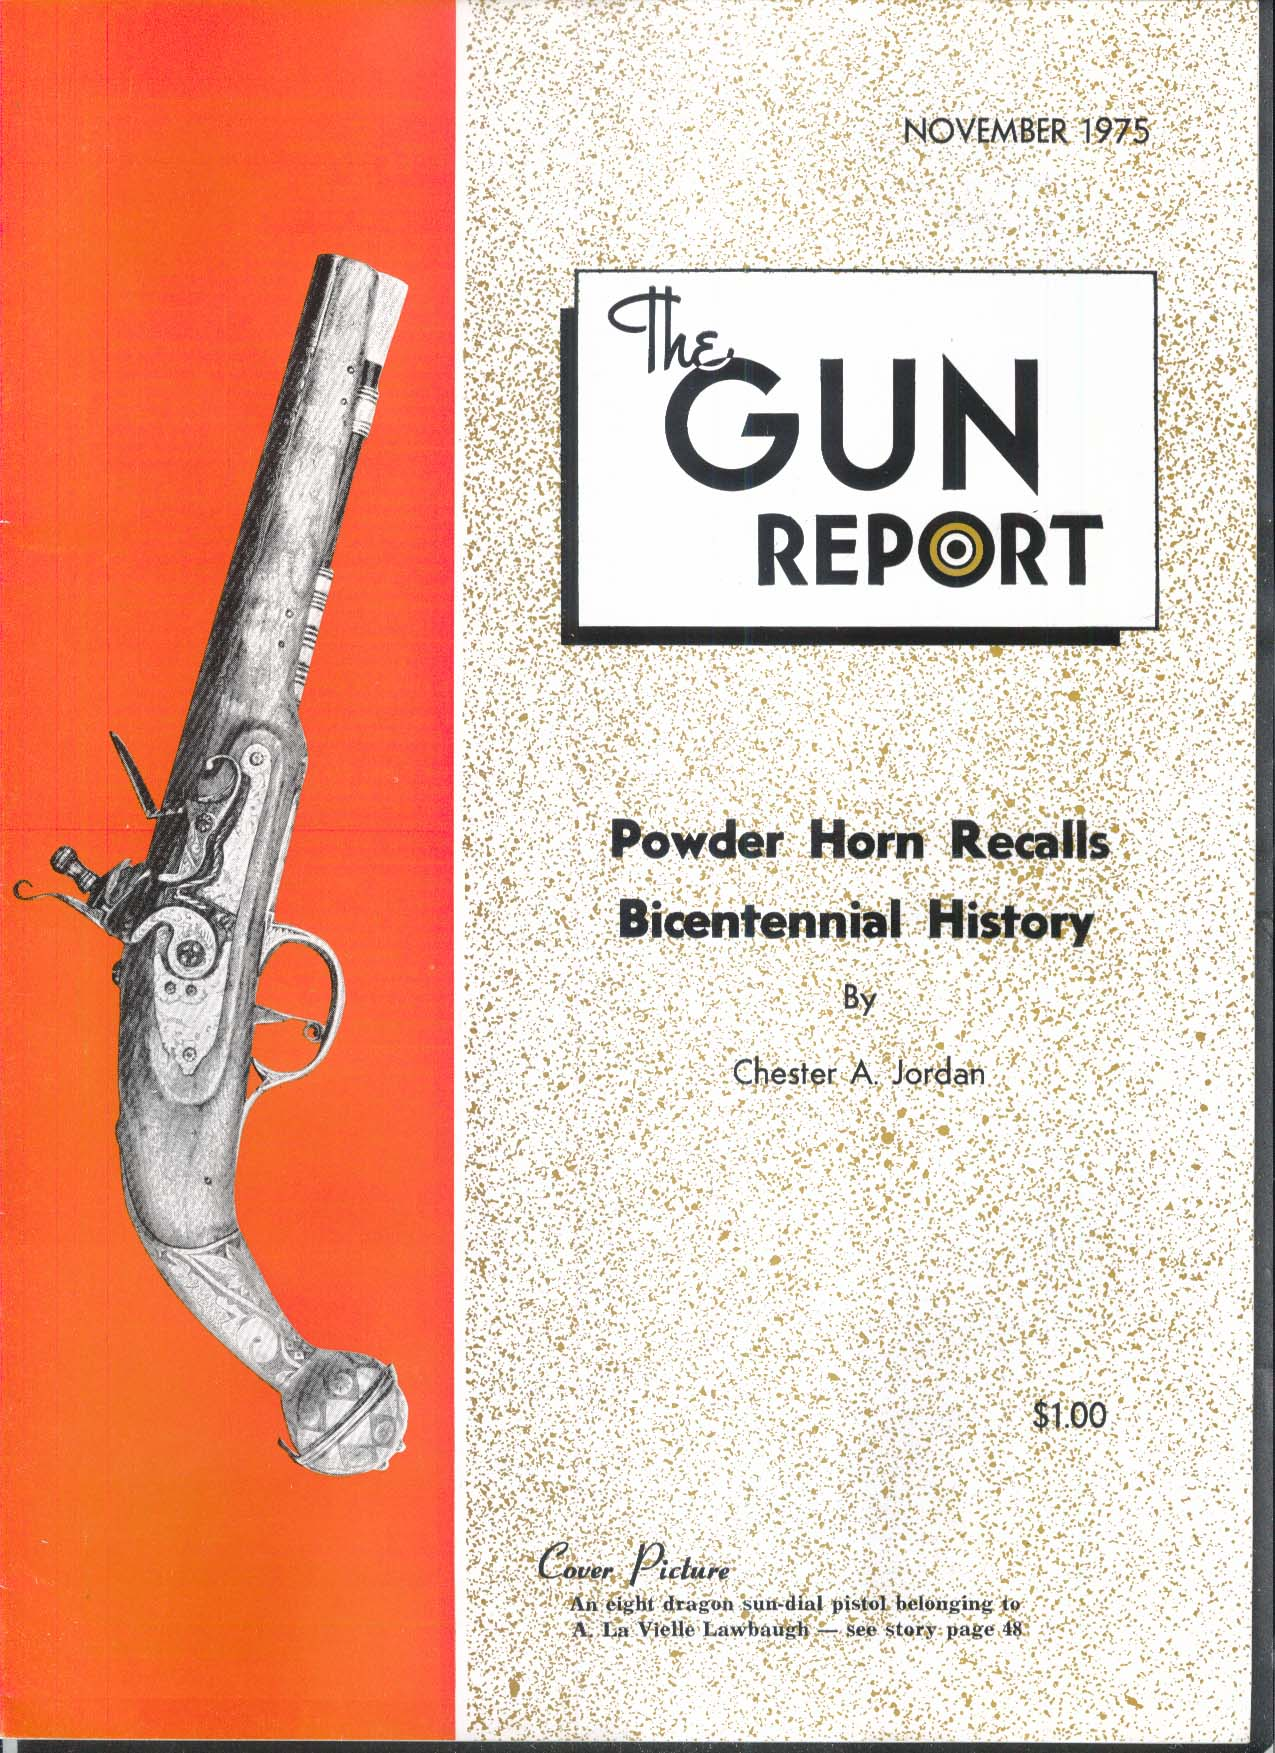 GUN REPORT Powder Horn La Vielle Lawbaugh Sun-Dial Pistol 11 1975